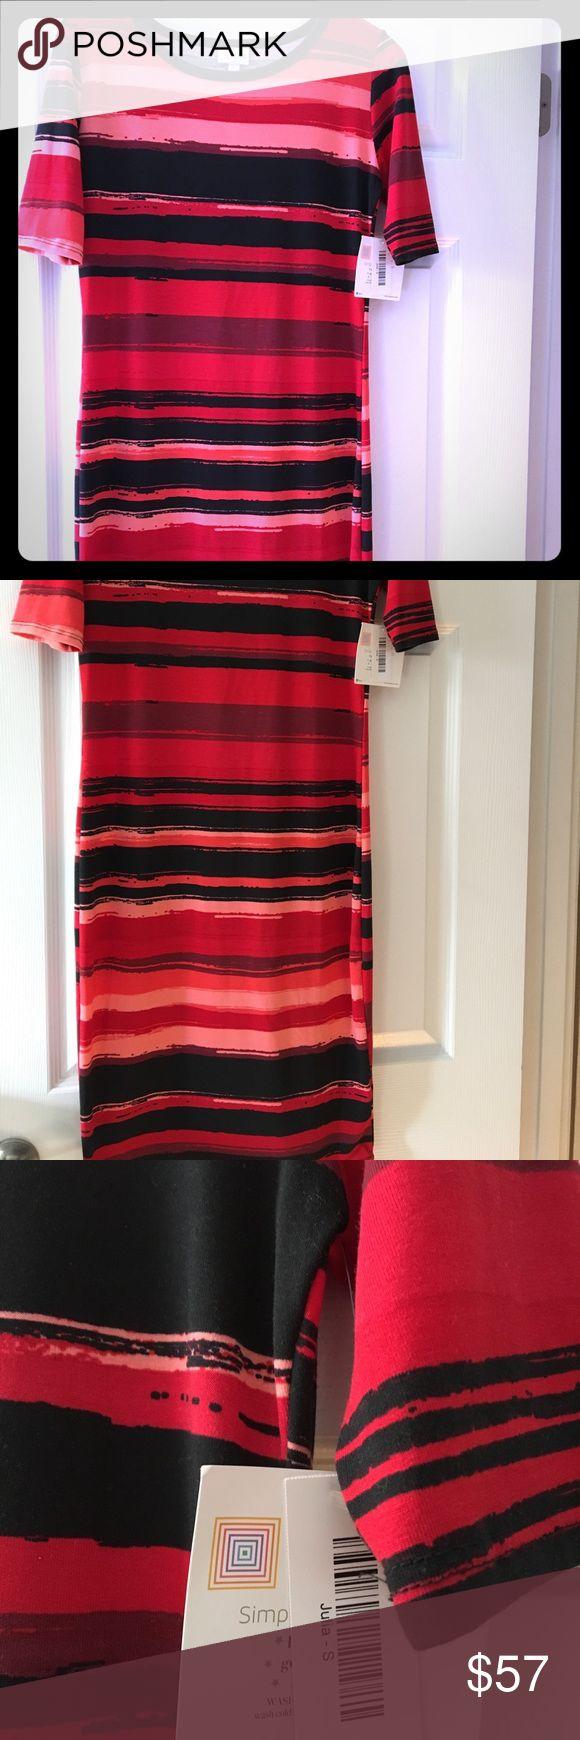 BNWT LulaRoe Julia BNWT LulaRoe Julia. Size small. Beautiful reds and pinks. LuLaRoe Dresses Midi